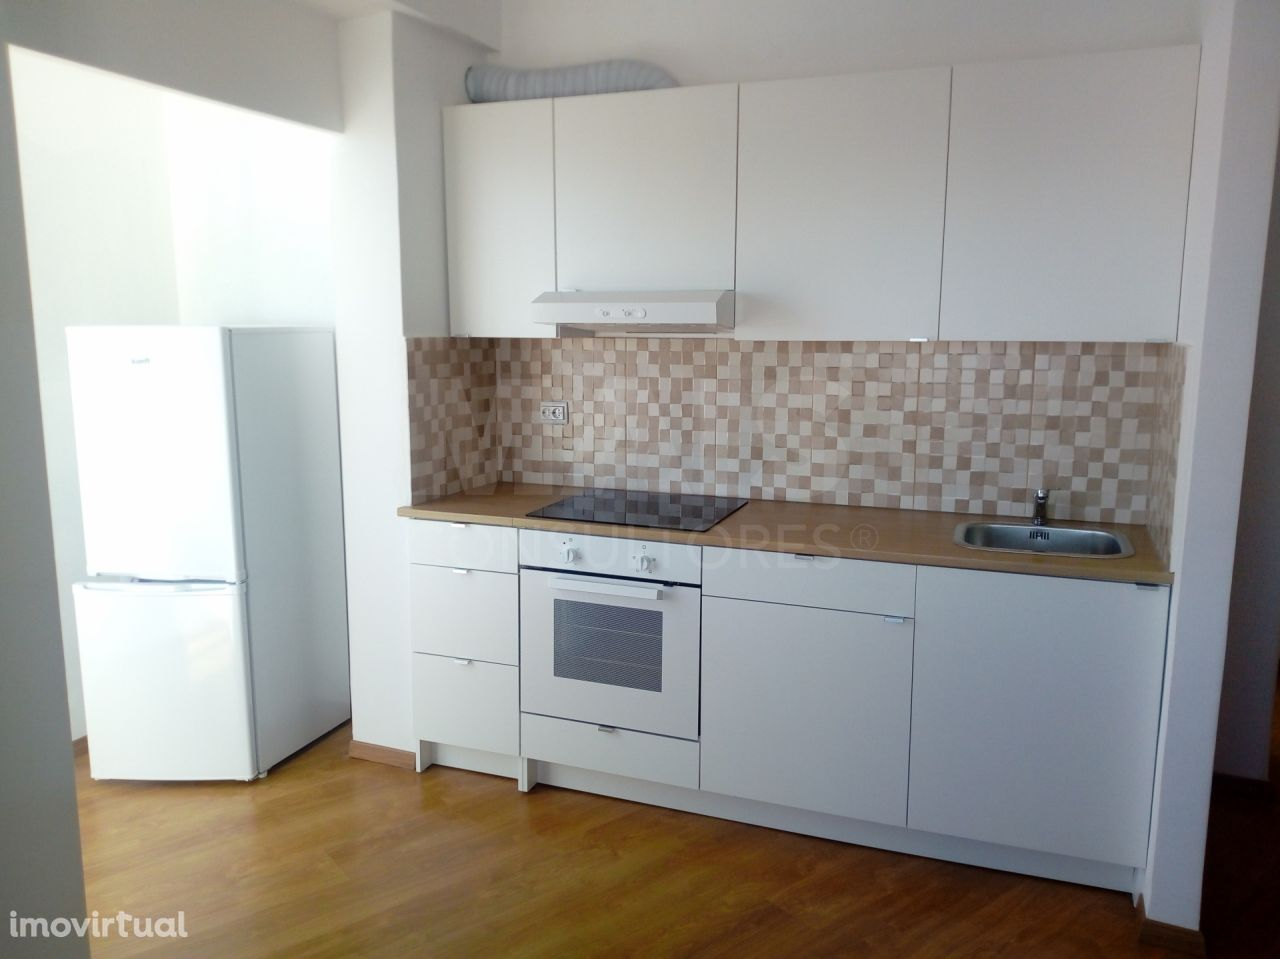 Apartamento T1, 51 m2, Reboleira (Amadora)